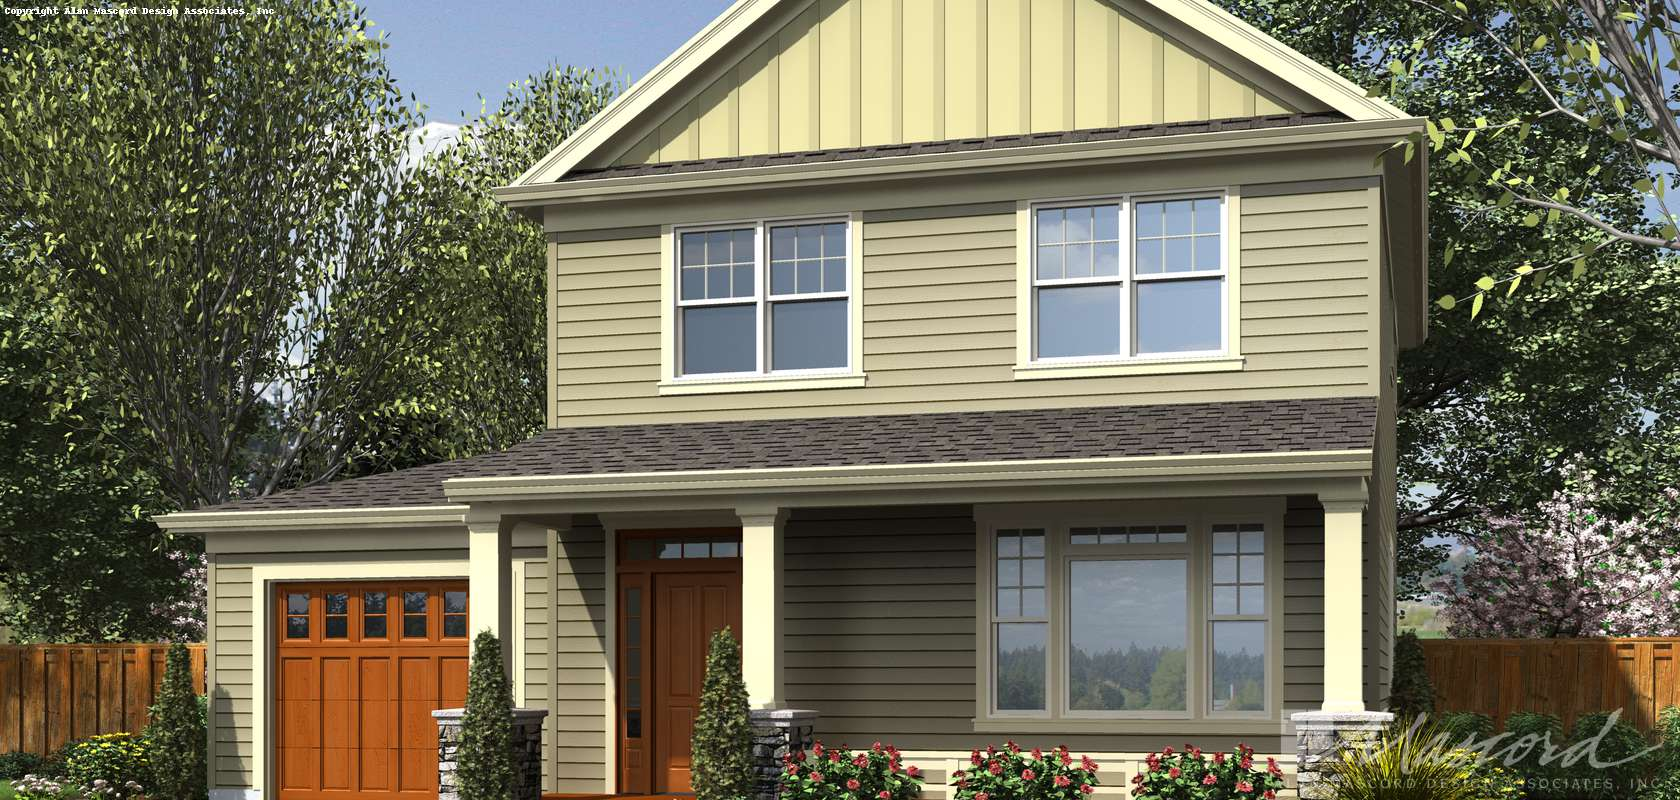 Mascord House Plan 21143: The Gabriel